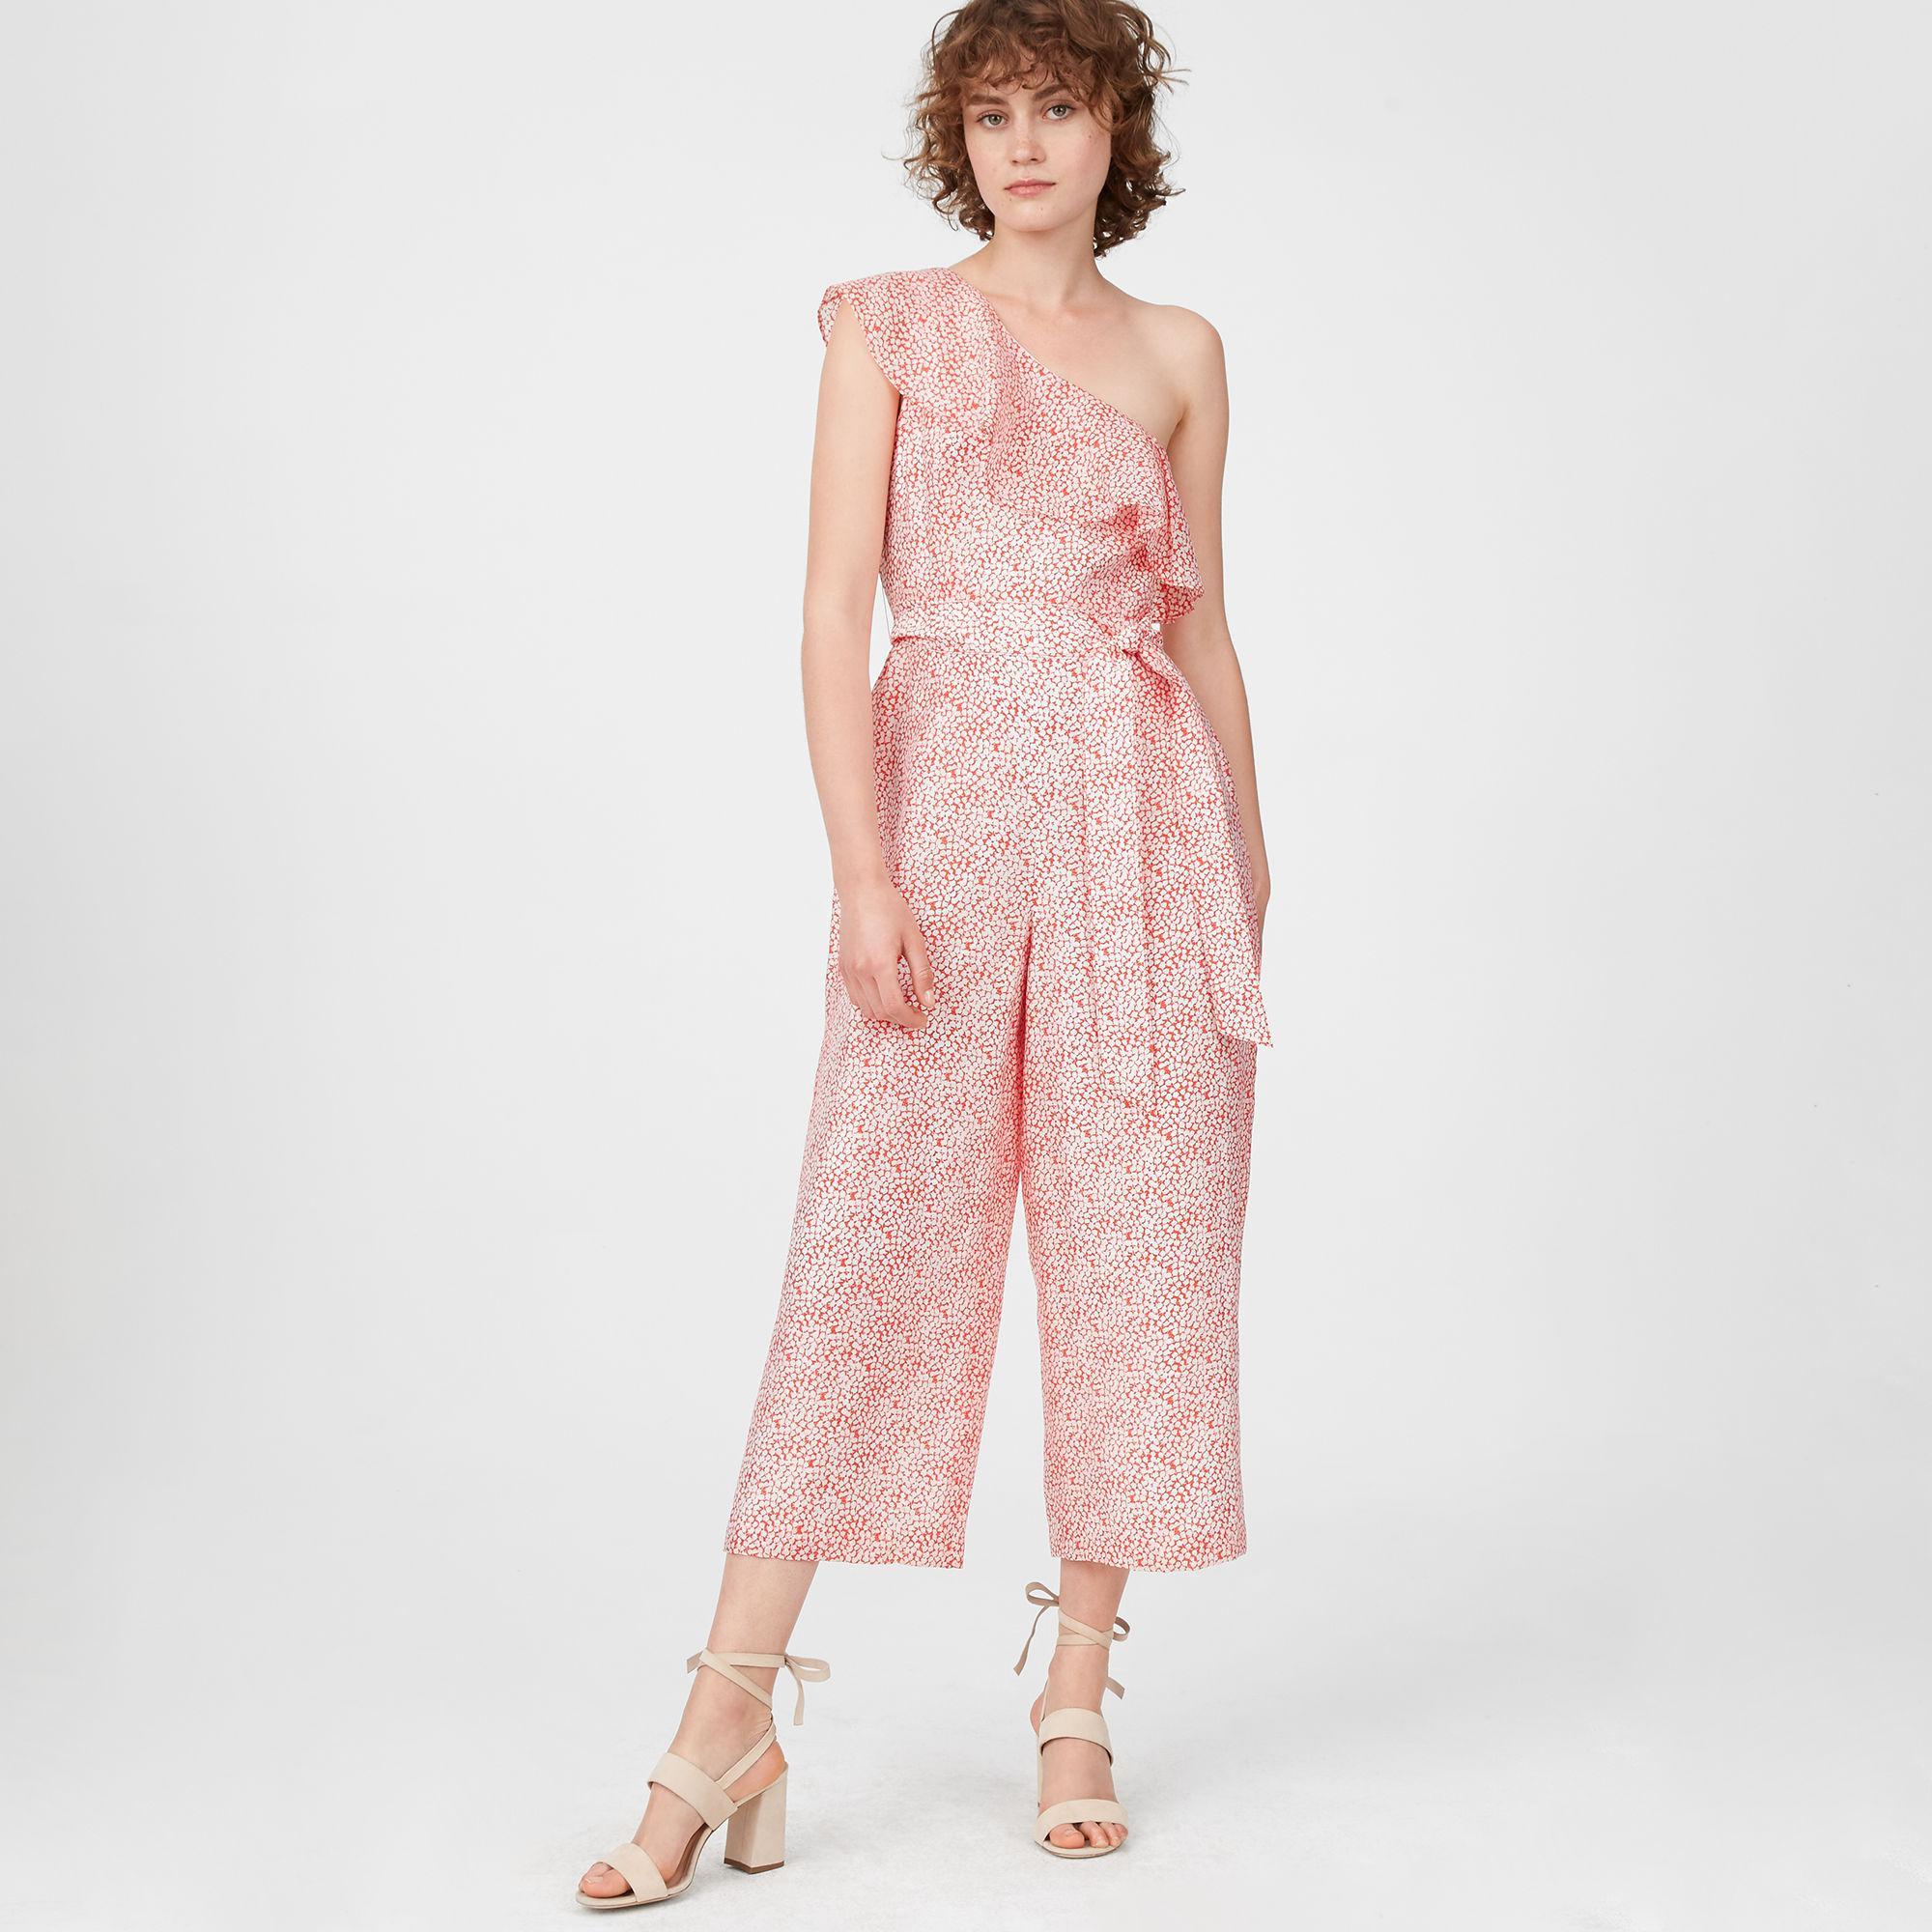 d798b66f01ed Lyst - Club Monaco Lene Printed Jumpsuit in Pink